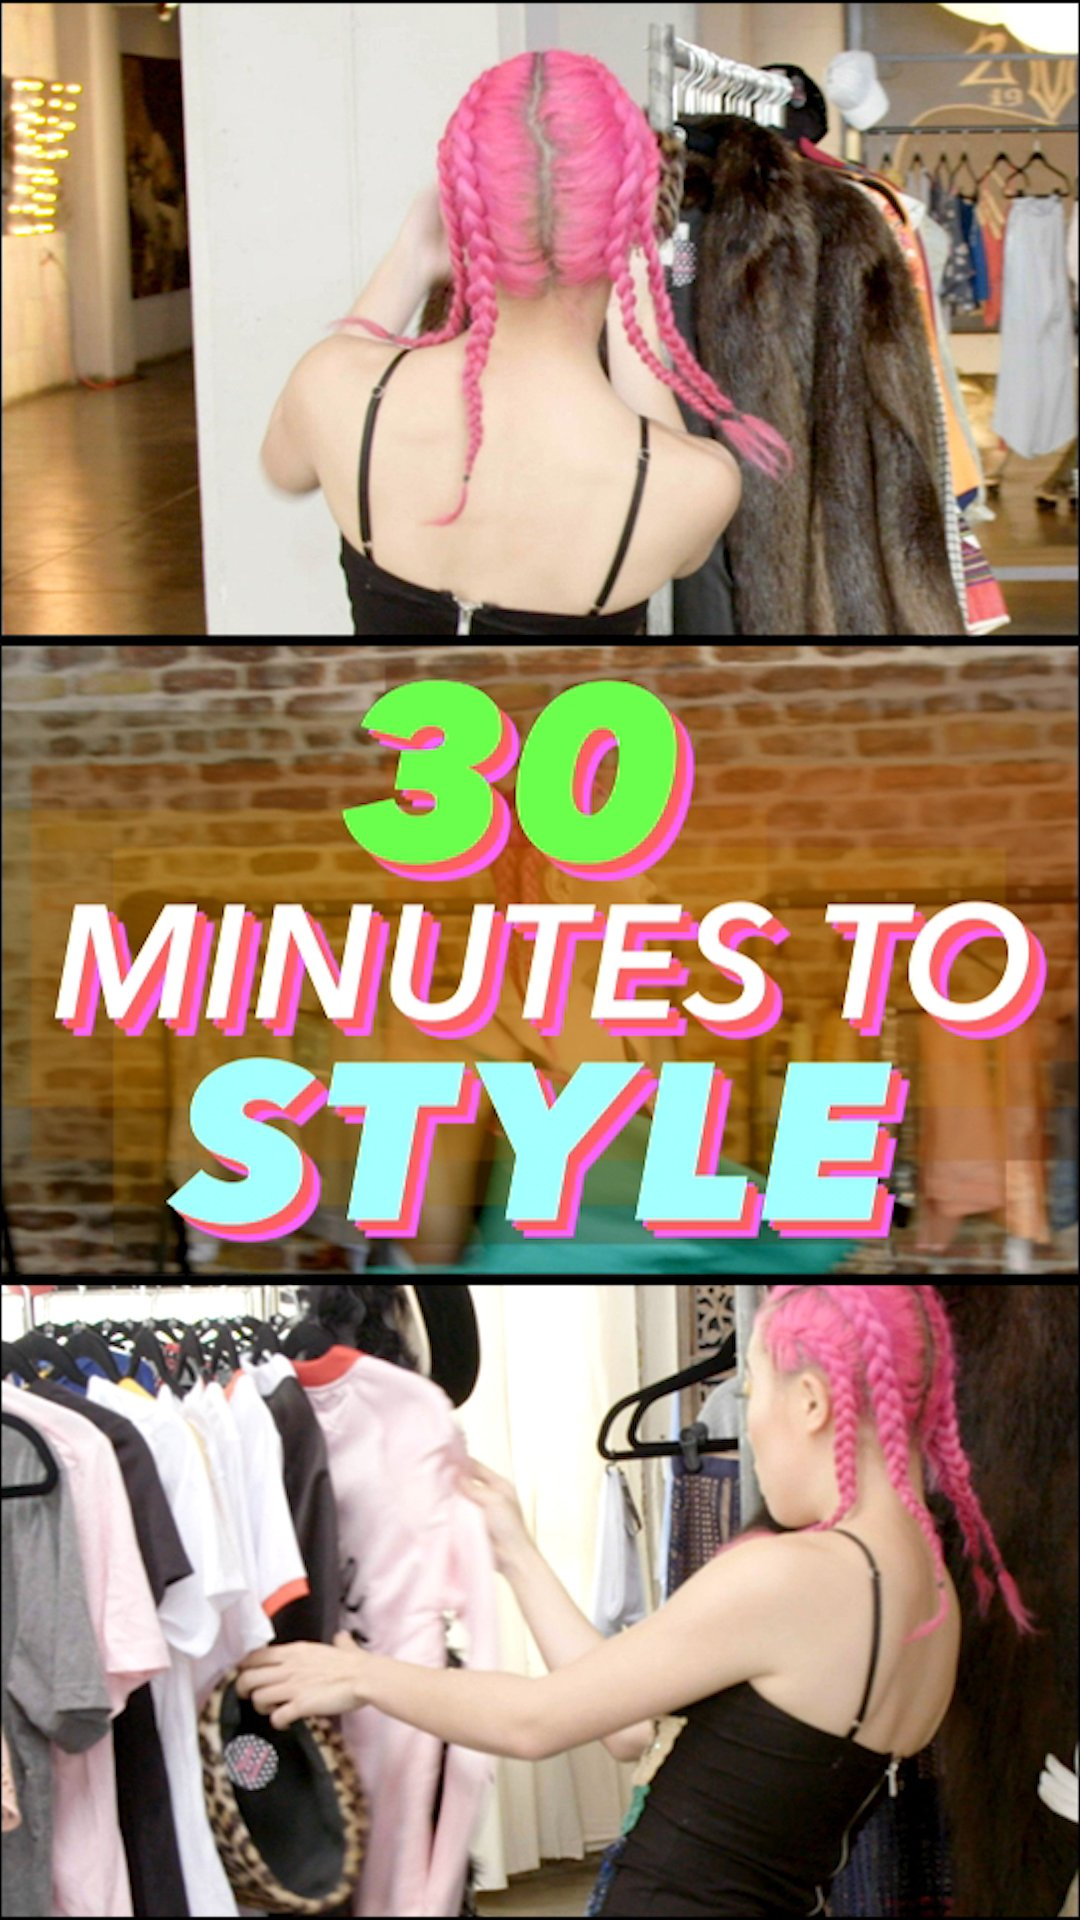 snapchat fashion show sophia lopez